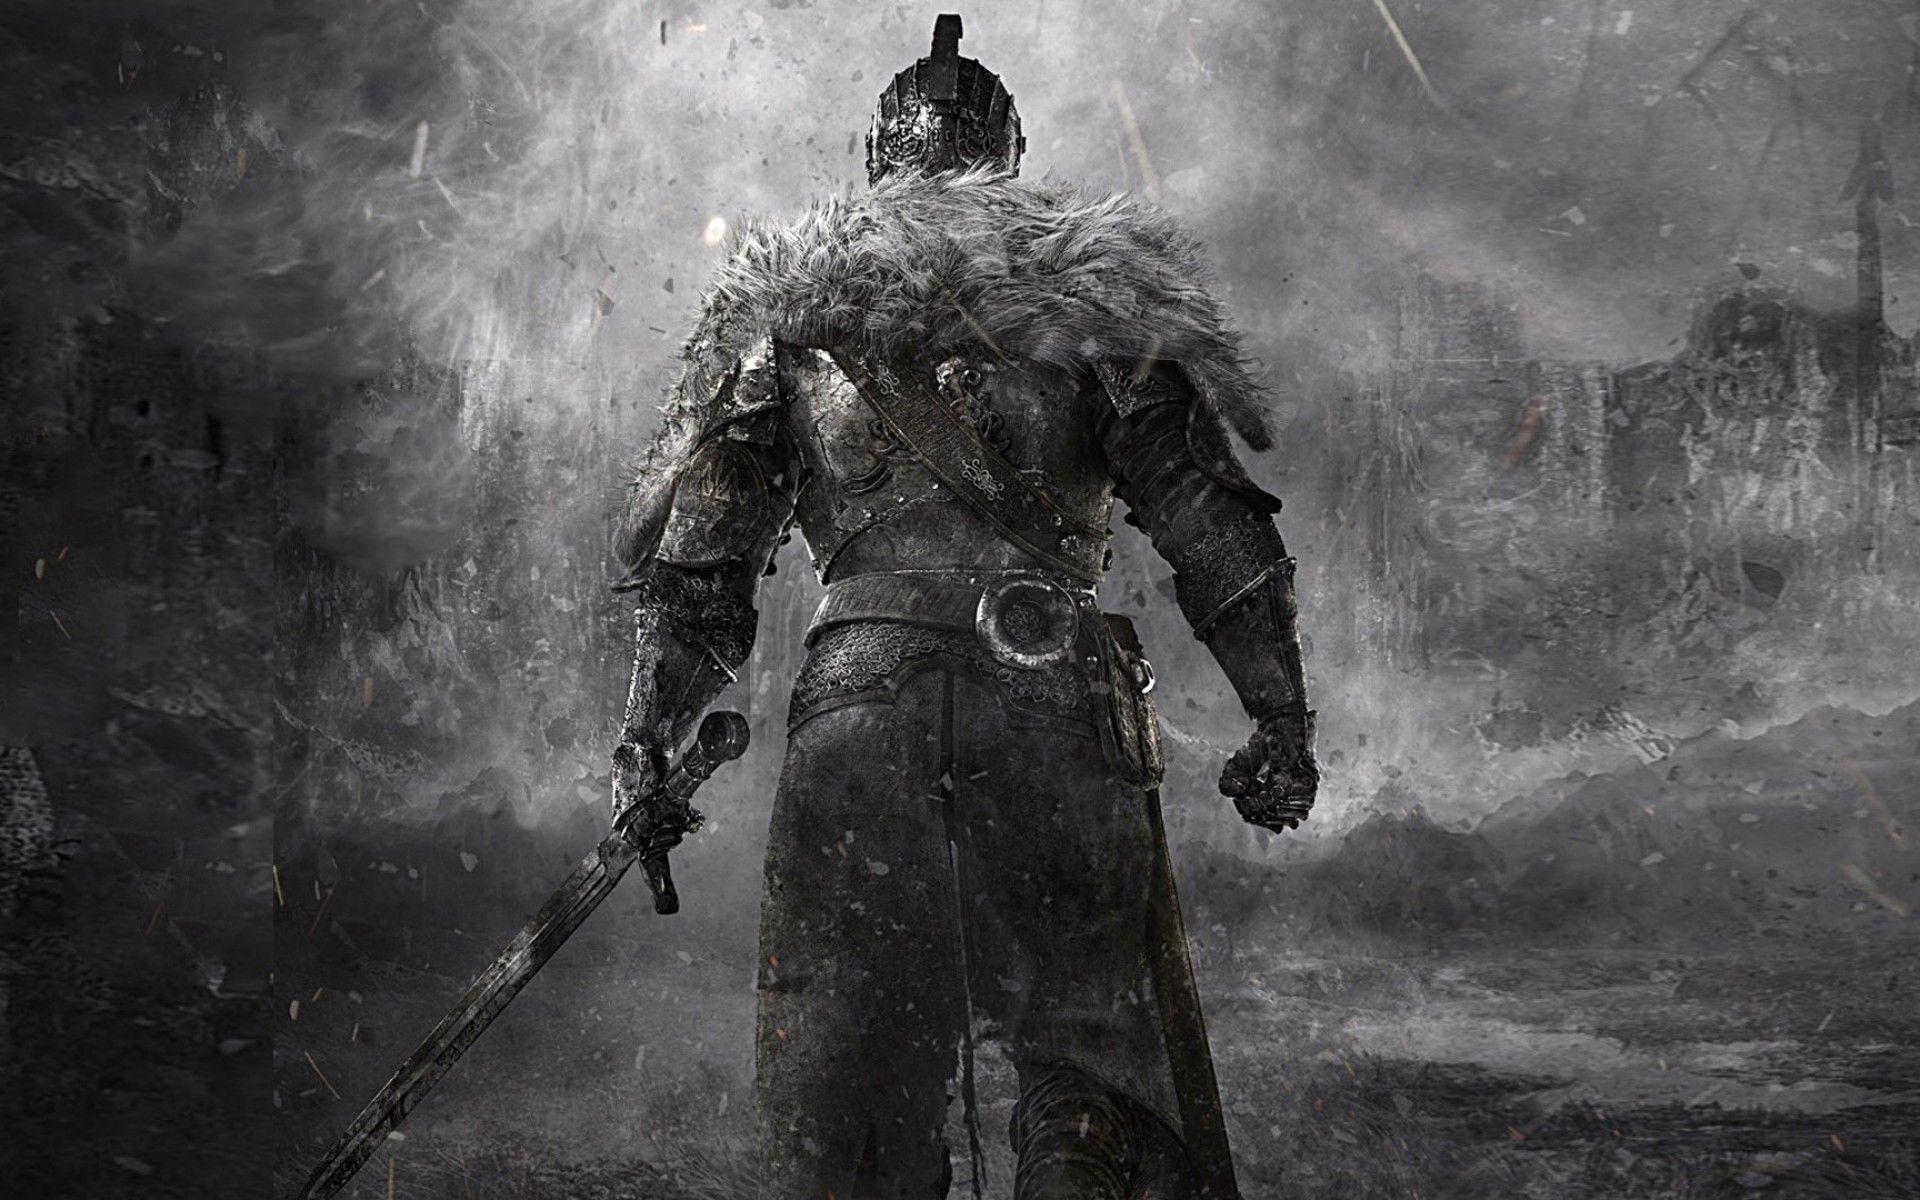 Dark Souls 2 Wallpapers - Top Free Dark Souls 2 Backgrounds -  WallpaperAccess